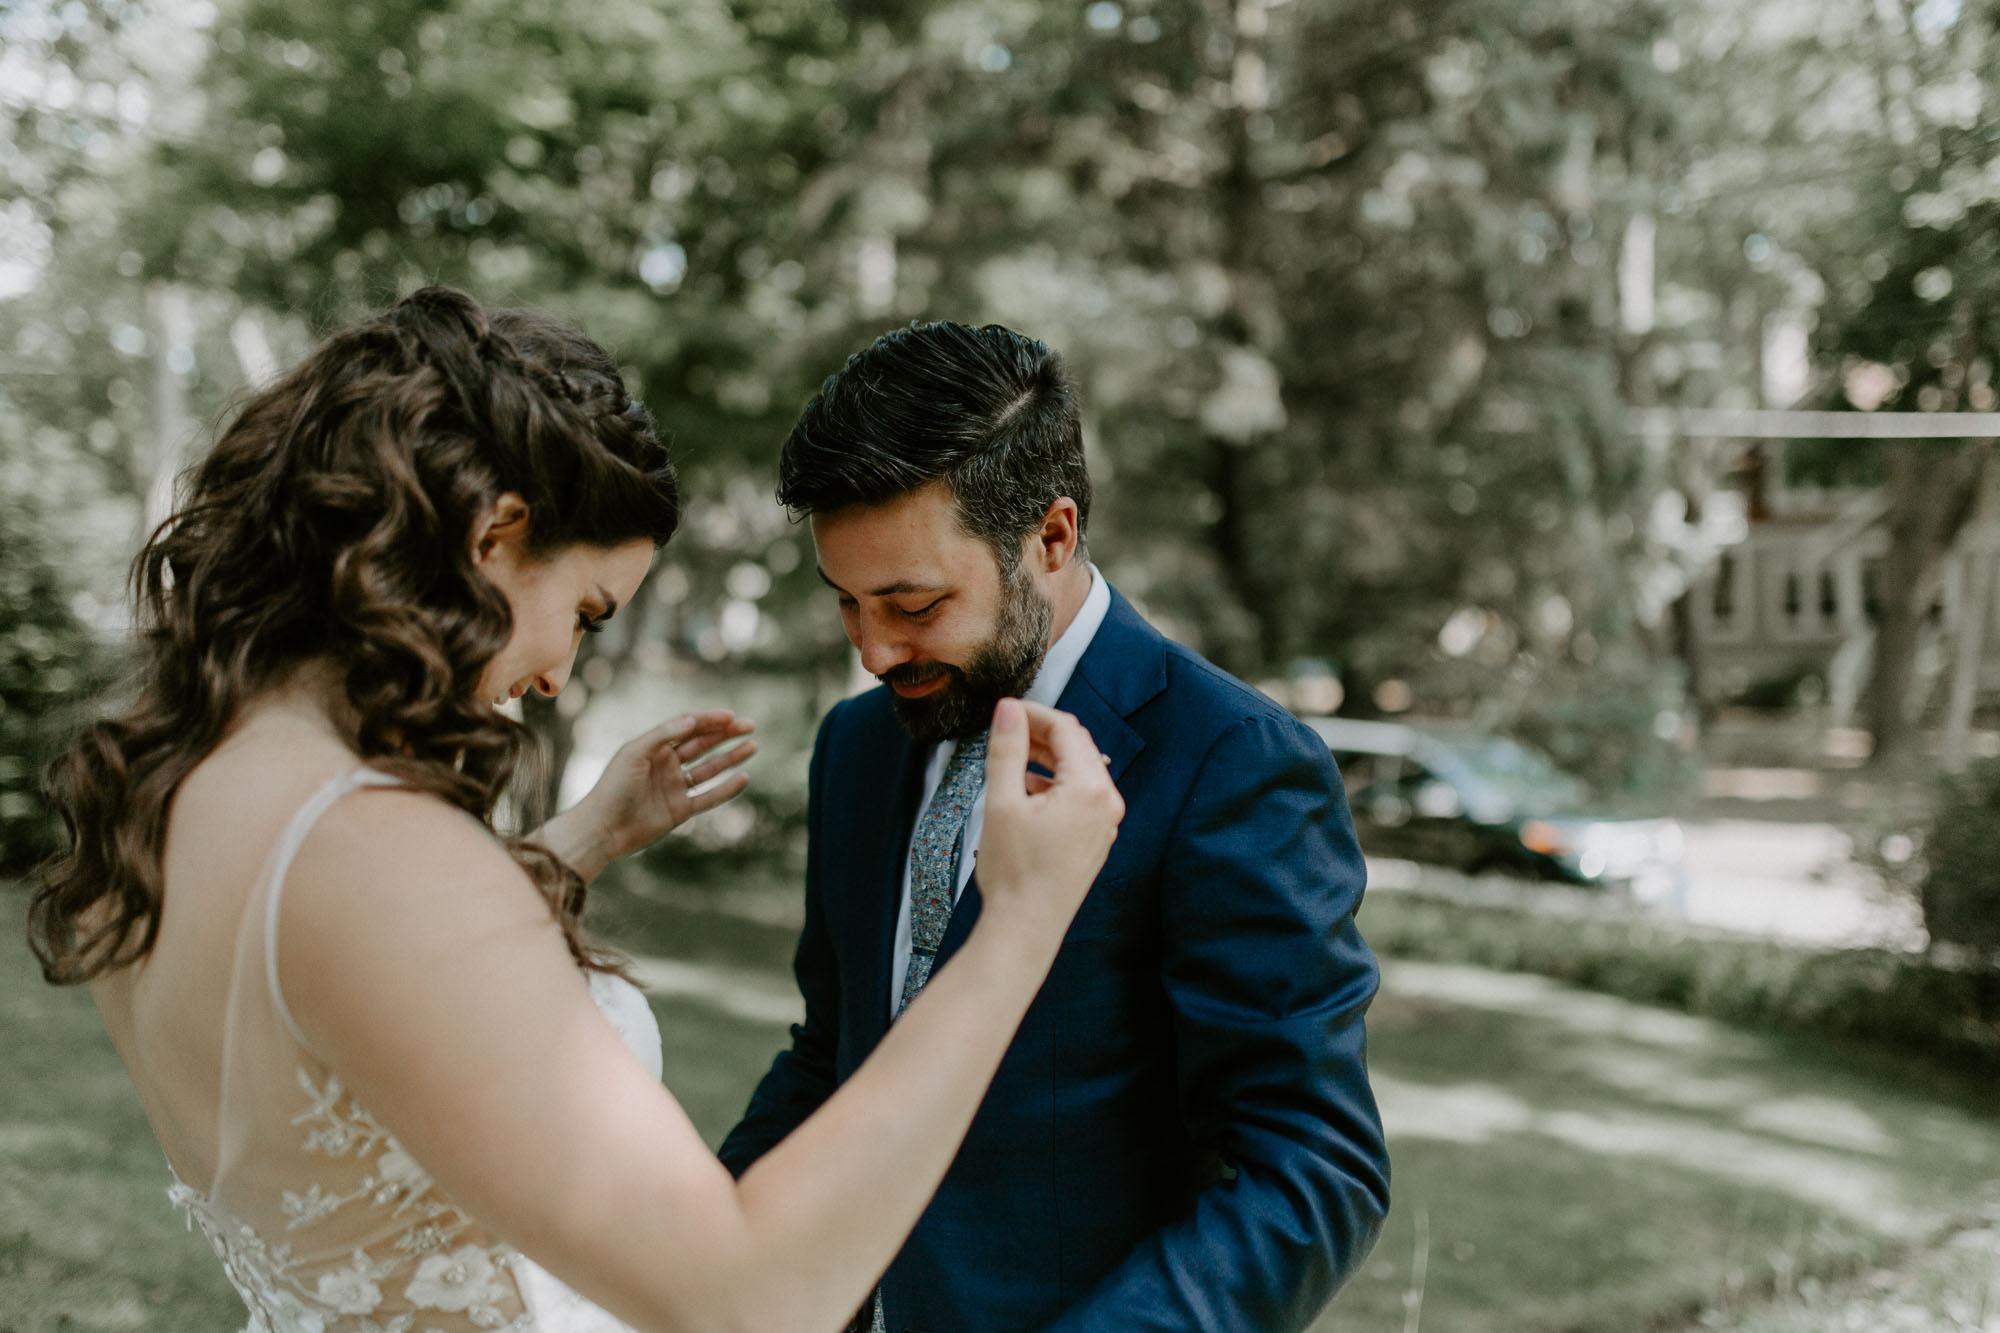 journeyman_distillery_wedding_photographer_chicago_il_wright_photographs-1444.jpg